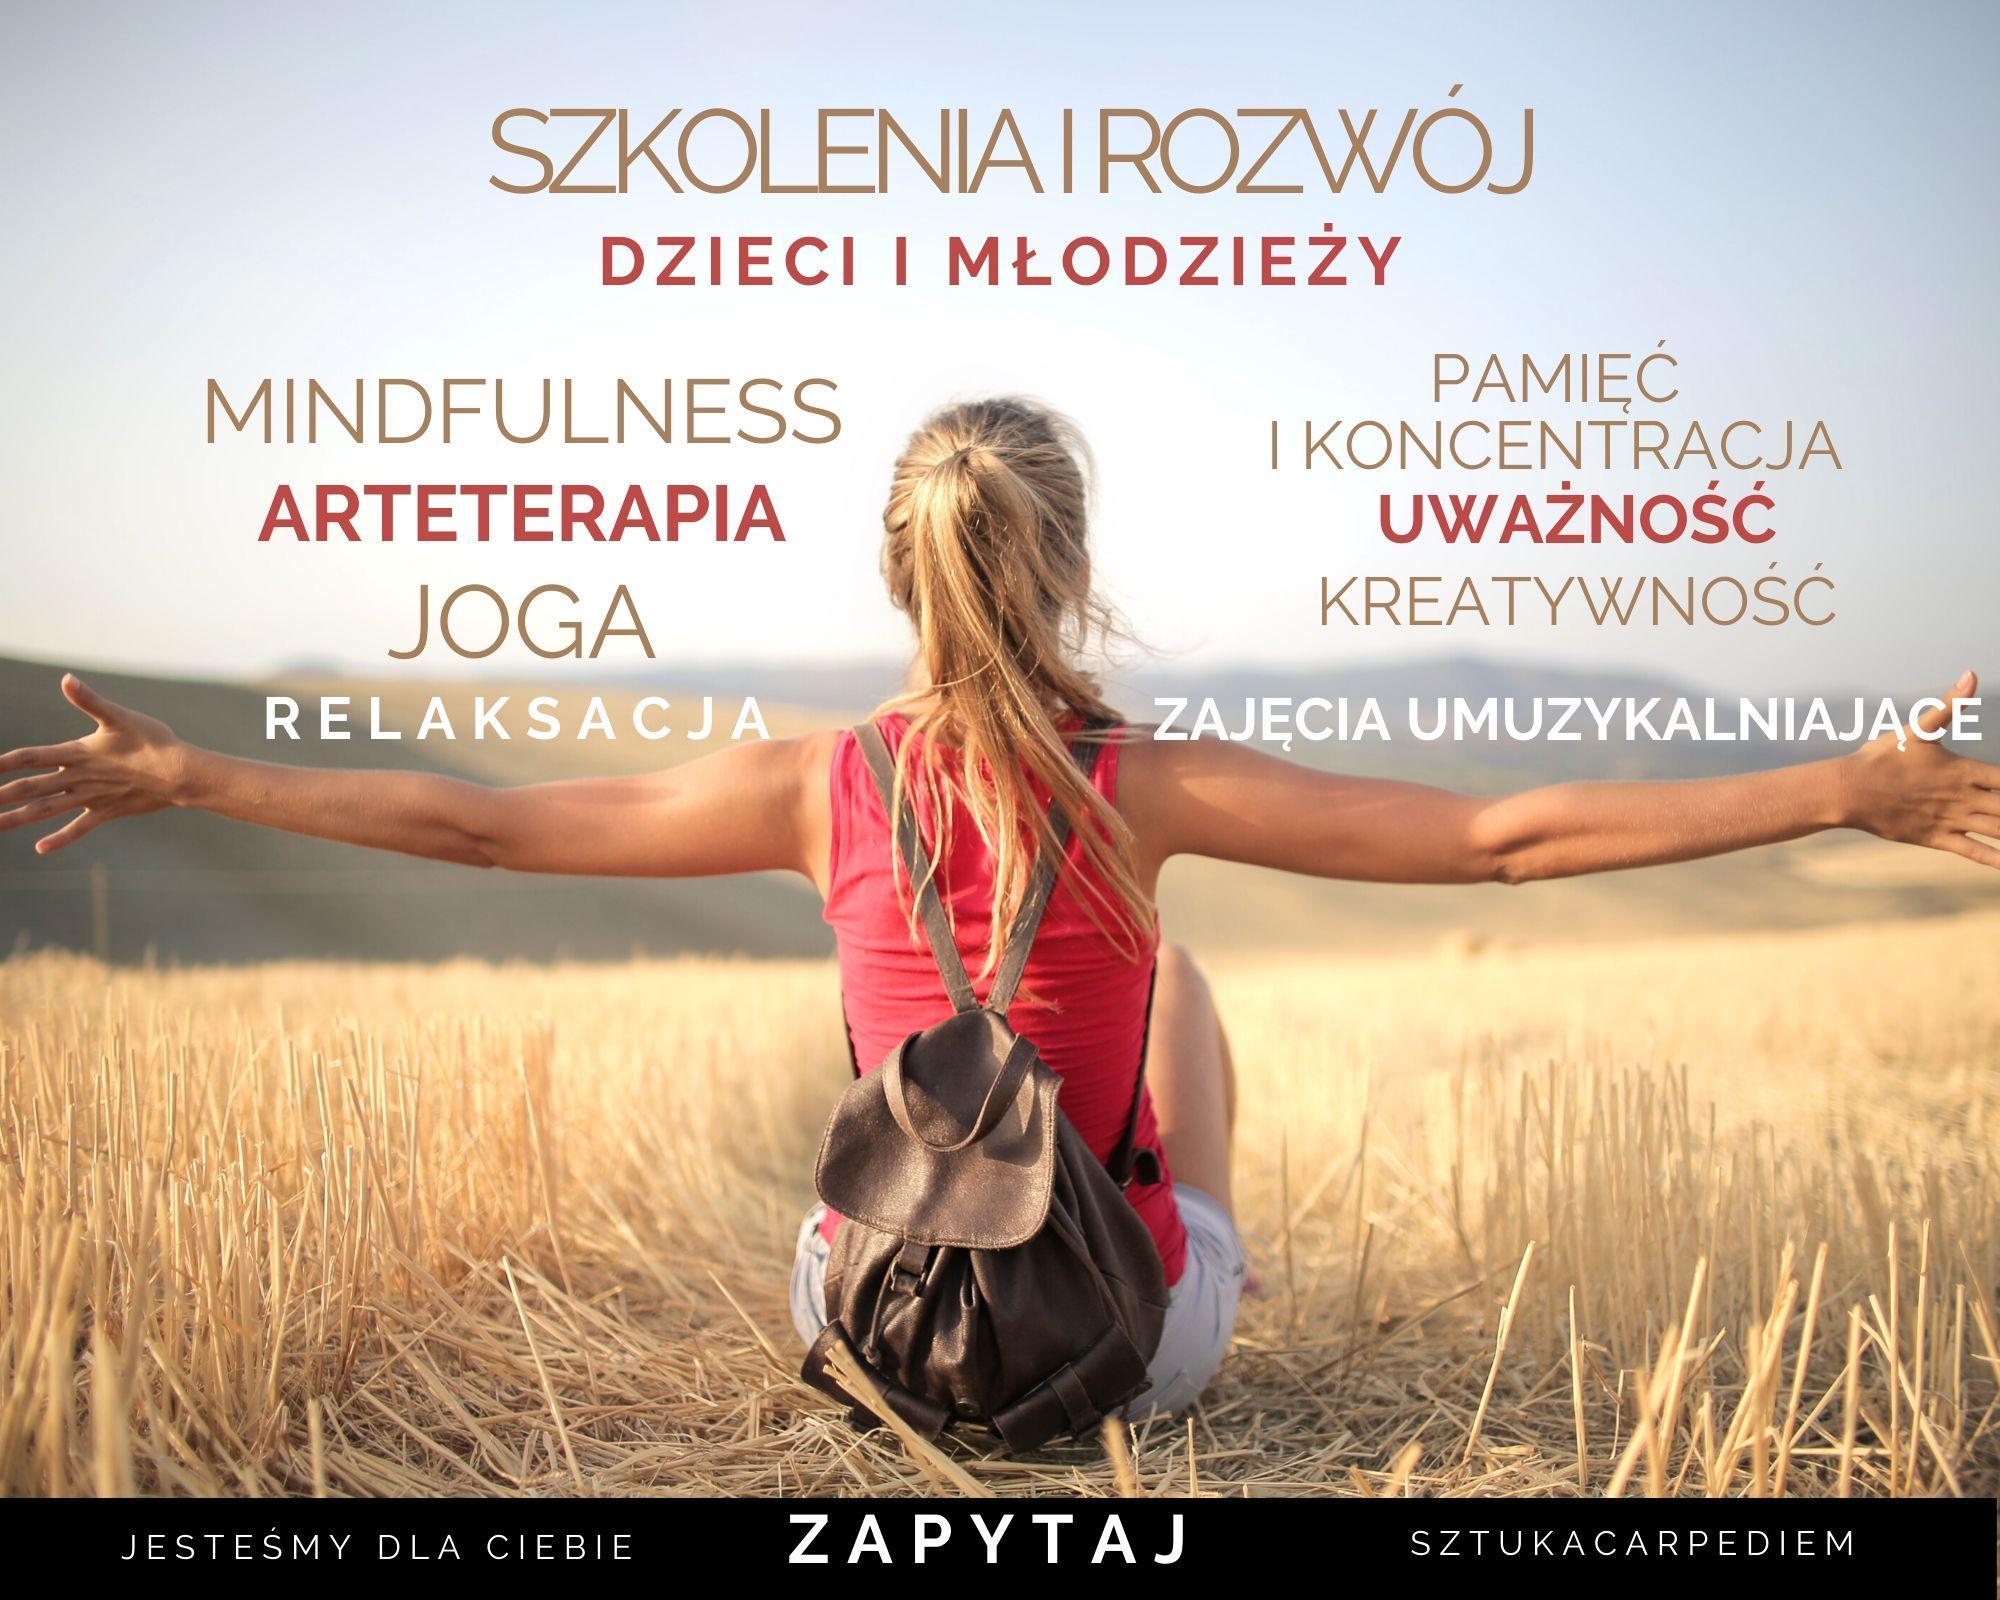 Mindfullness + arteterapia